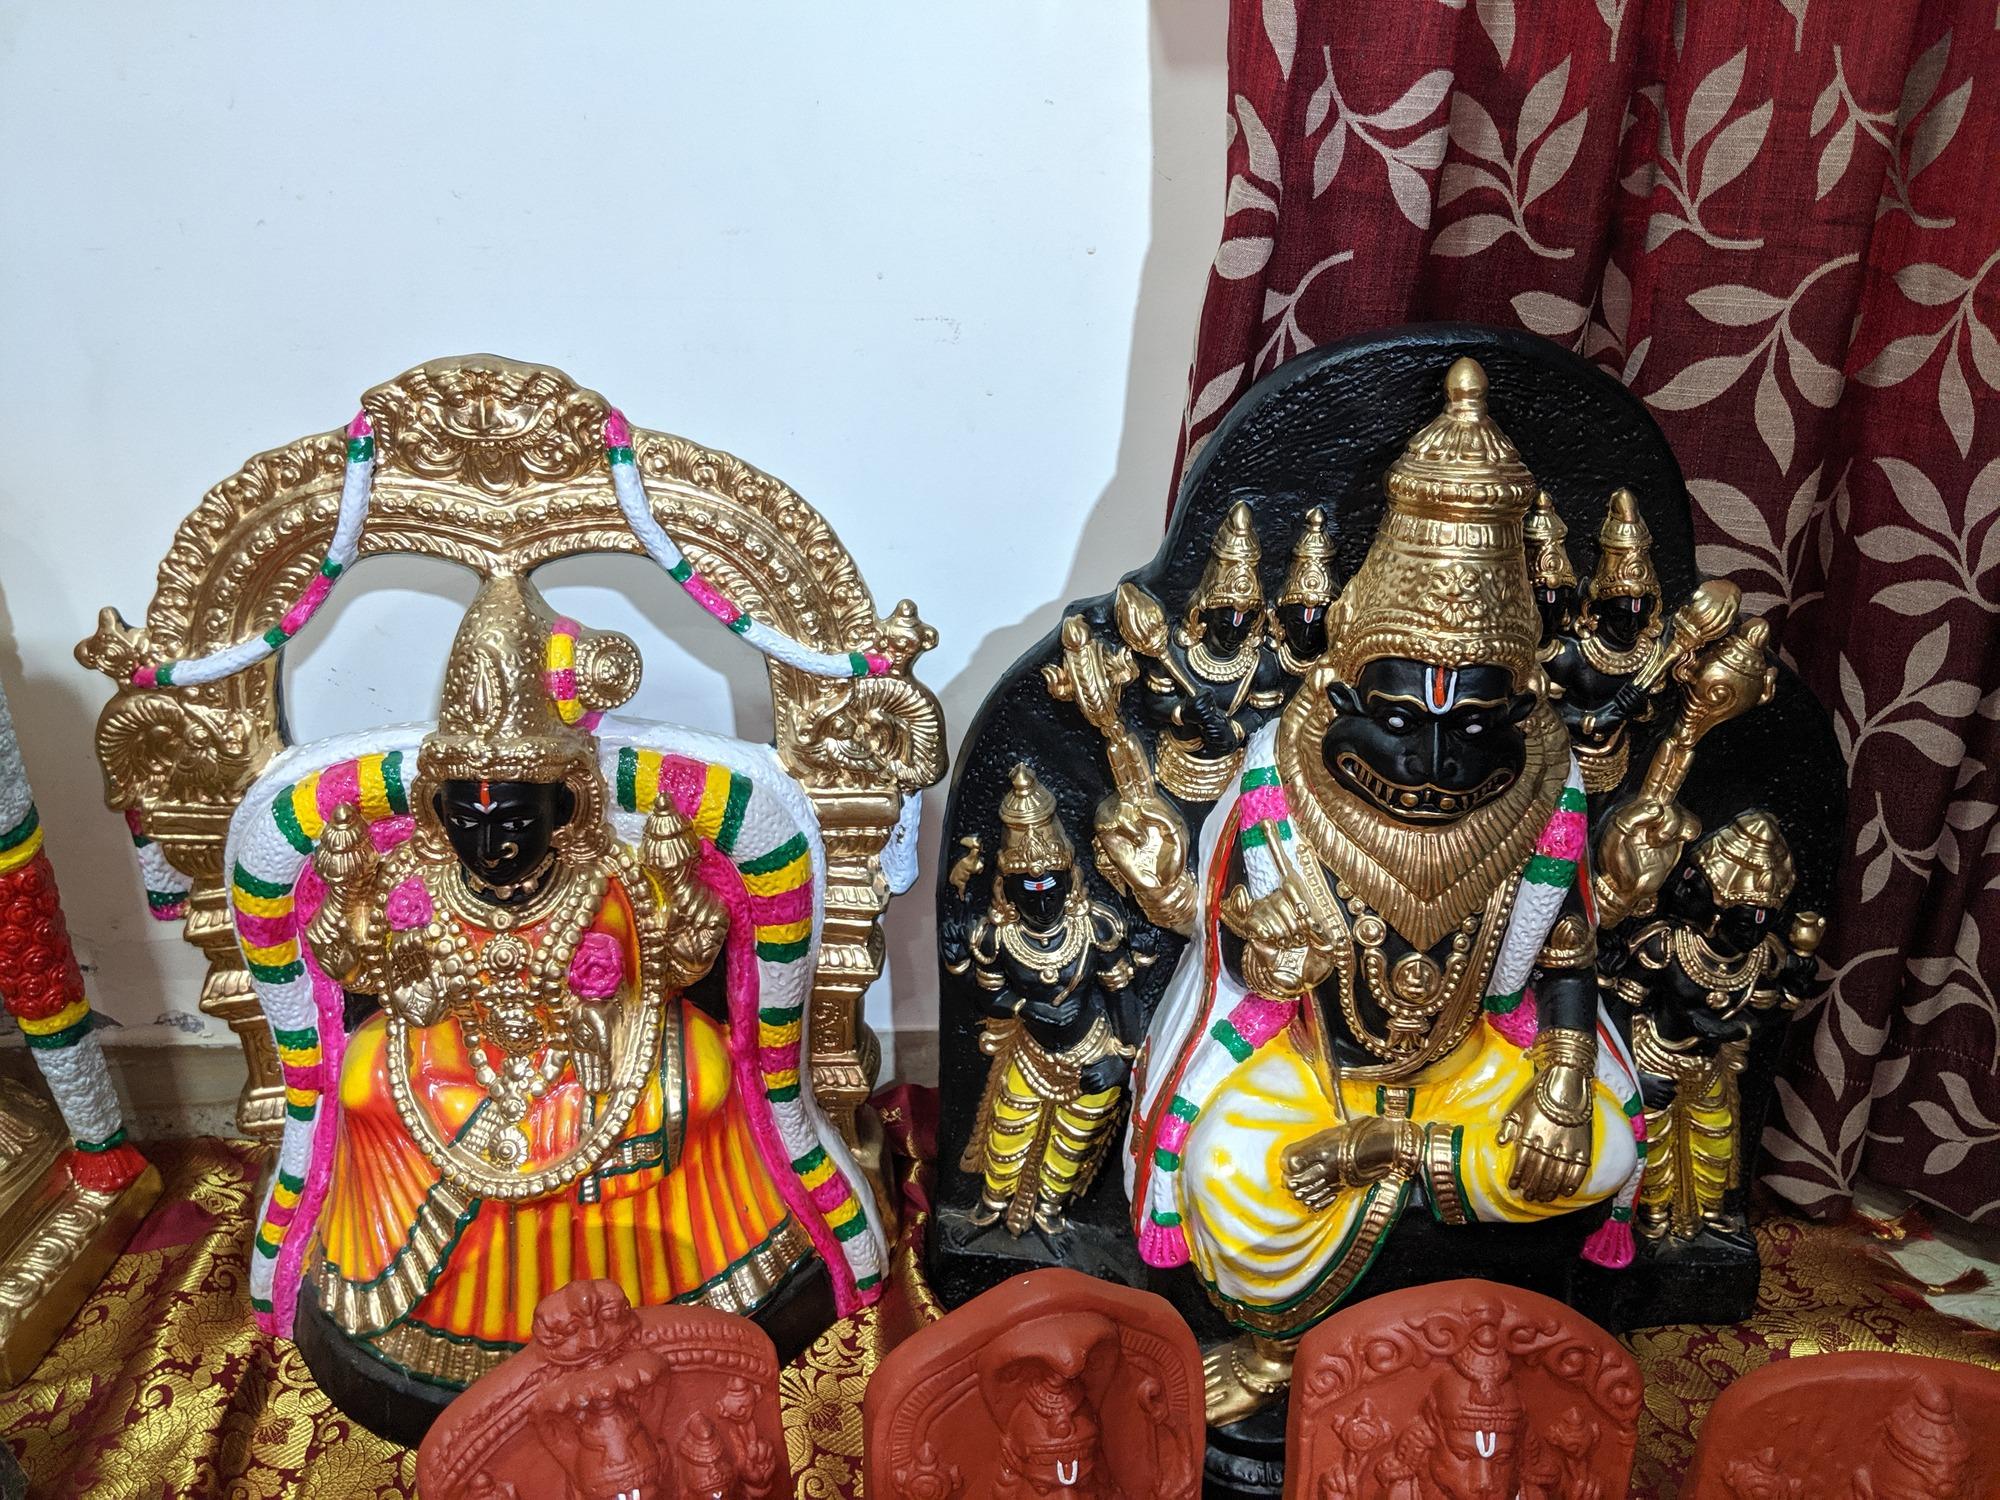 Sri Narasimhaswamy, Namakkal - ஸ்ரீ லட்சுமி நரசிம்மர், நாமக்கல்